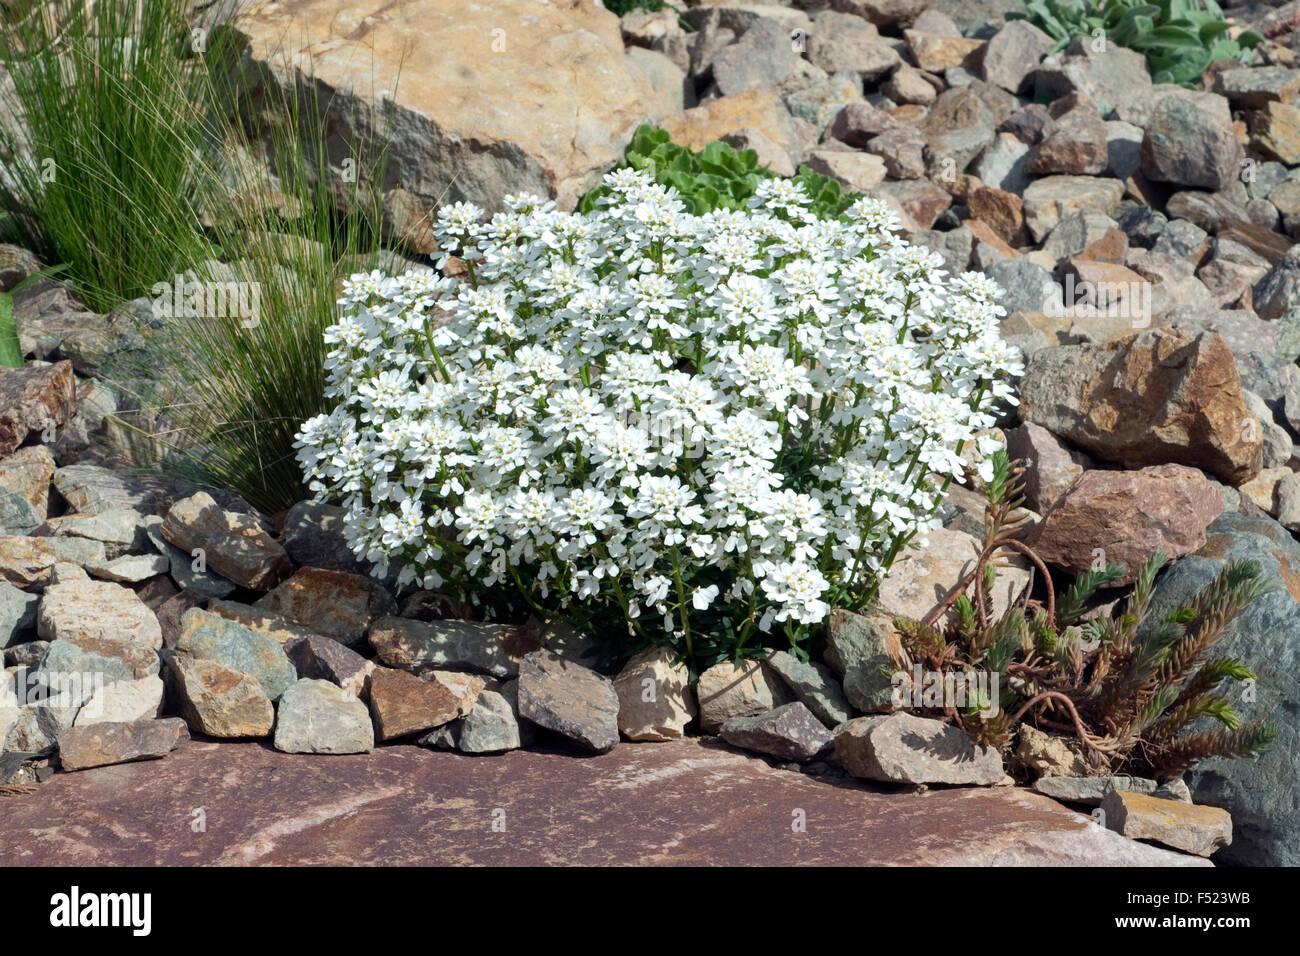 Schleifenblume, Iberis, sempervierens, Stock Photo